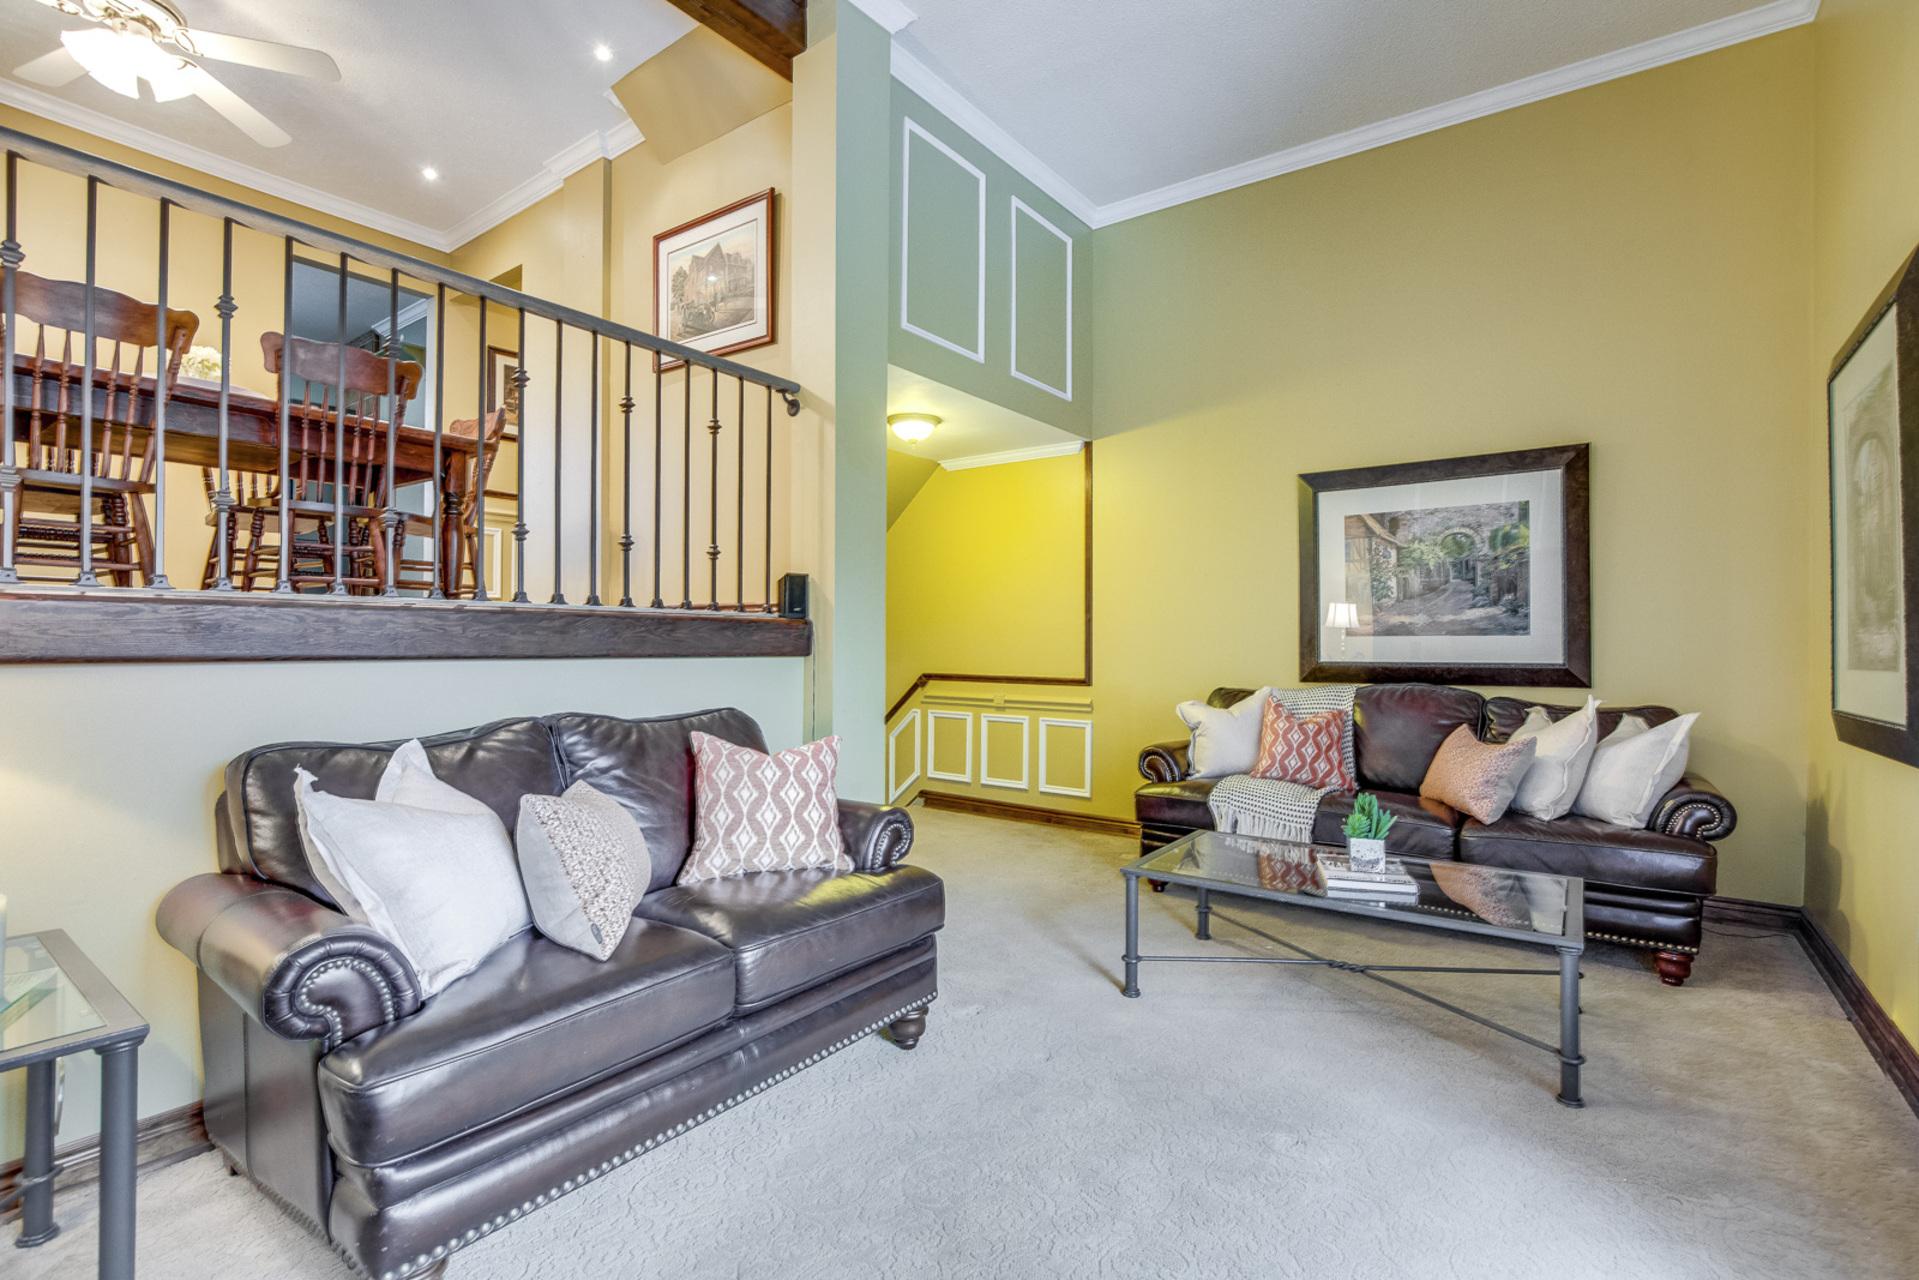 Living Room - 6 Rock Moss Way, North York - Elite3 & Team at 6 Rock Moss Way, Hillcrest Village, Toronto